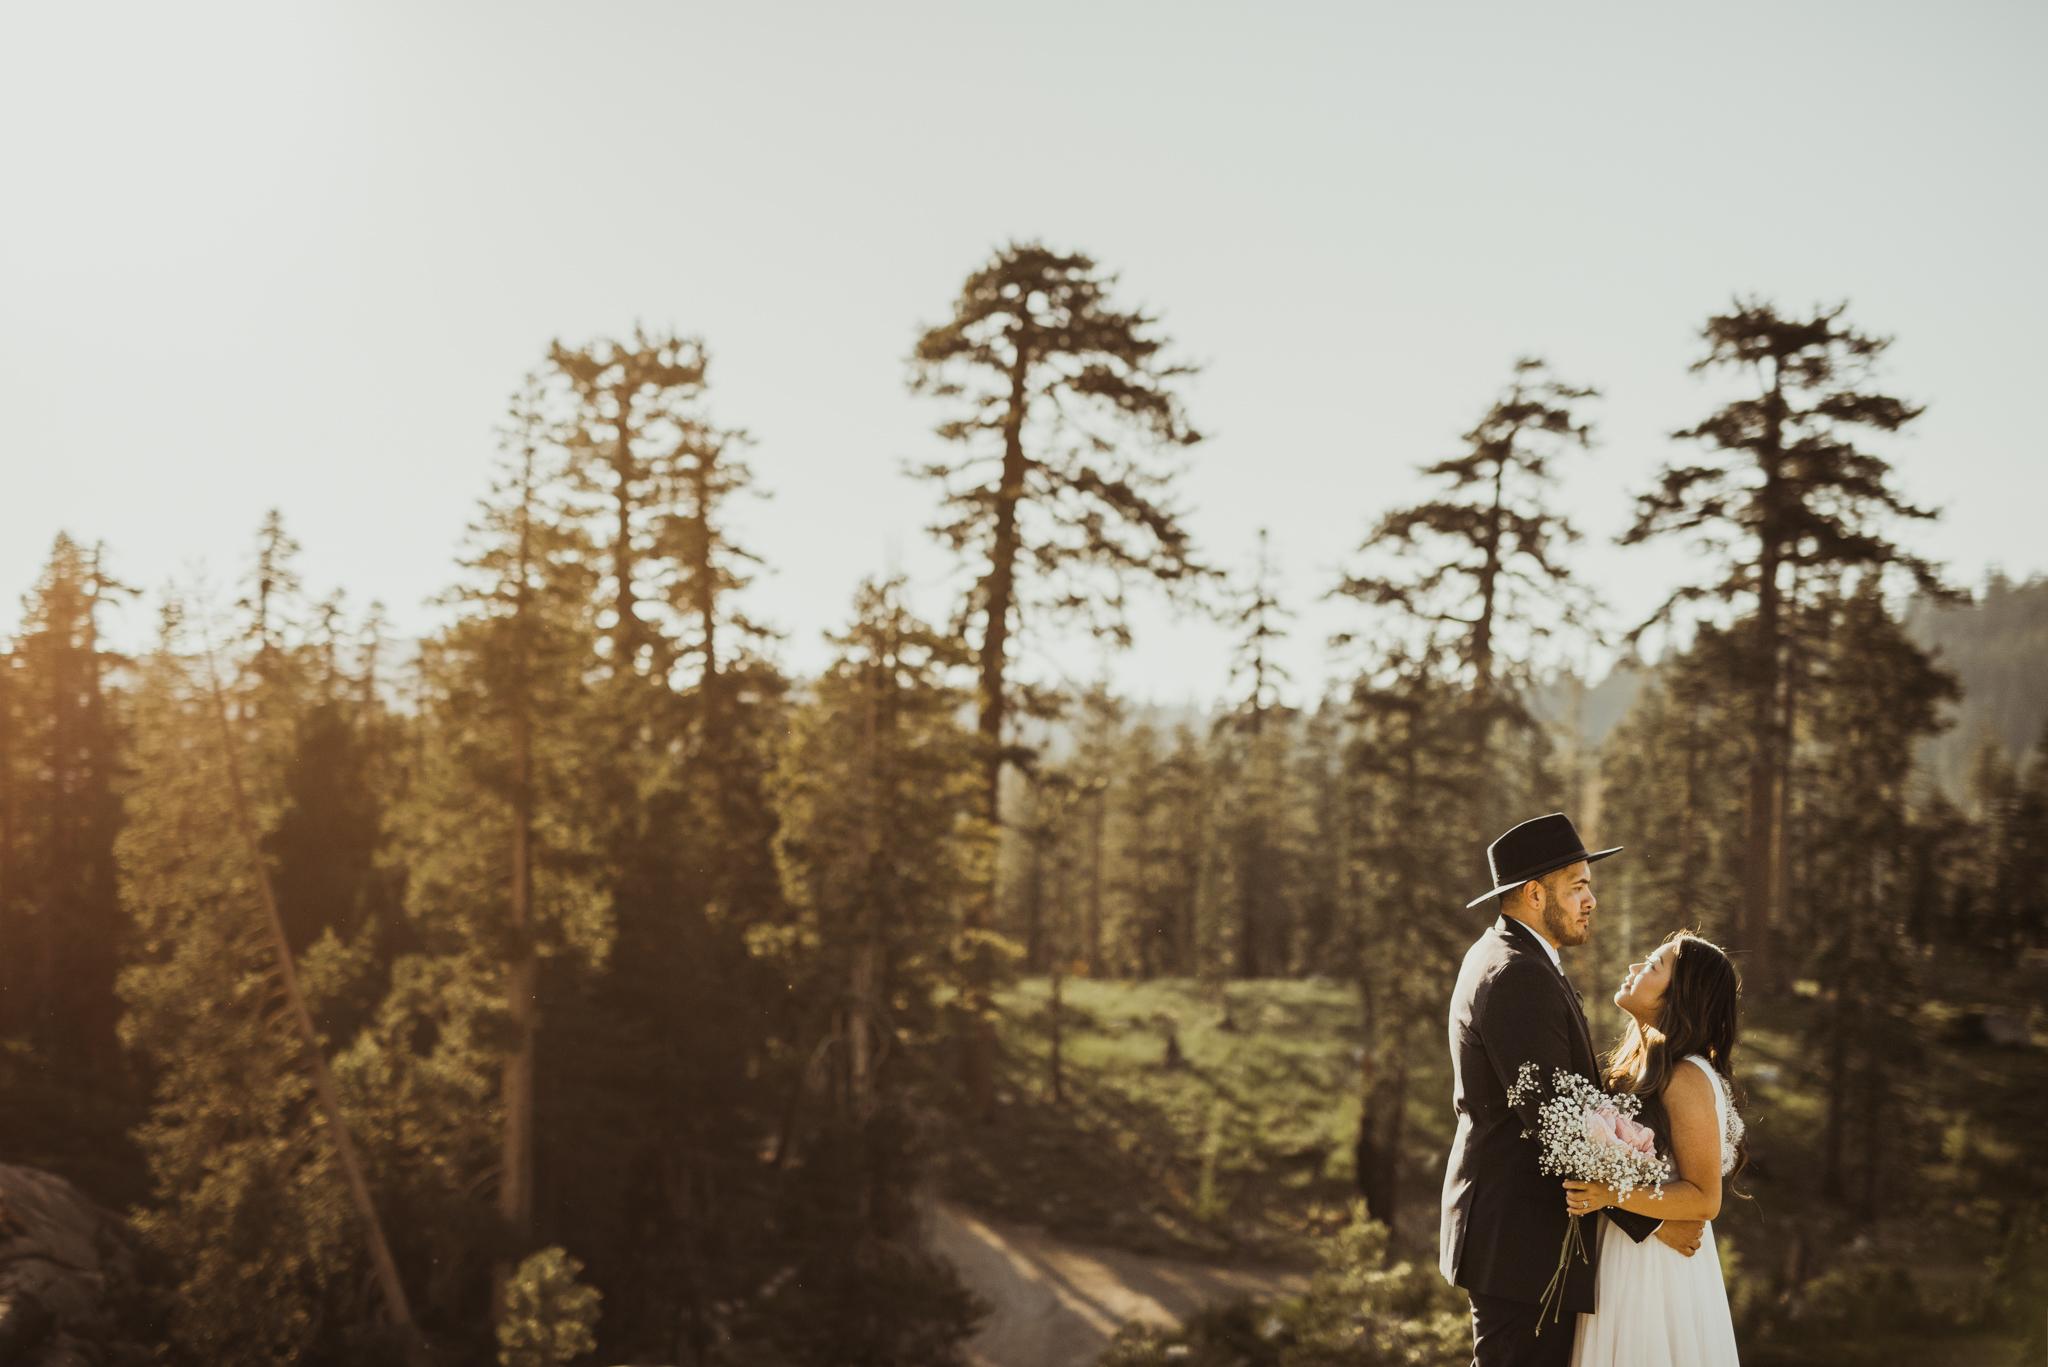 ©Isaiah & Taylor Photography -The Hideout Wedding, Kirkwood California, Lake Tahoe Wedding Photographer-167.jpg